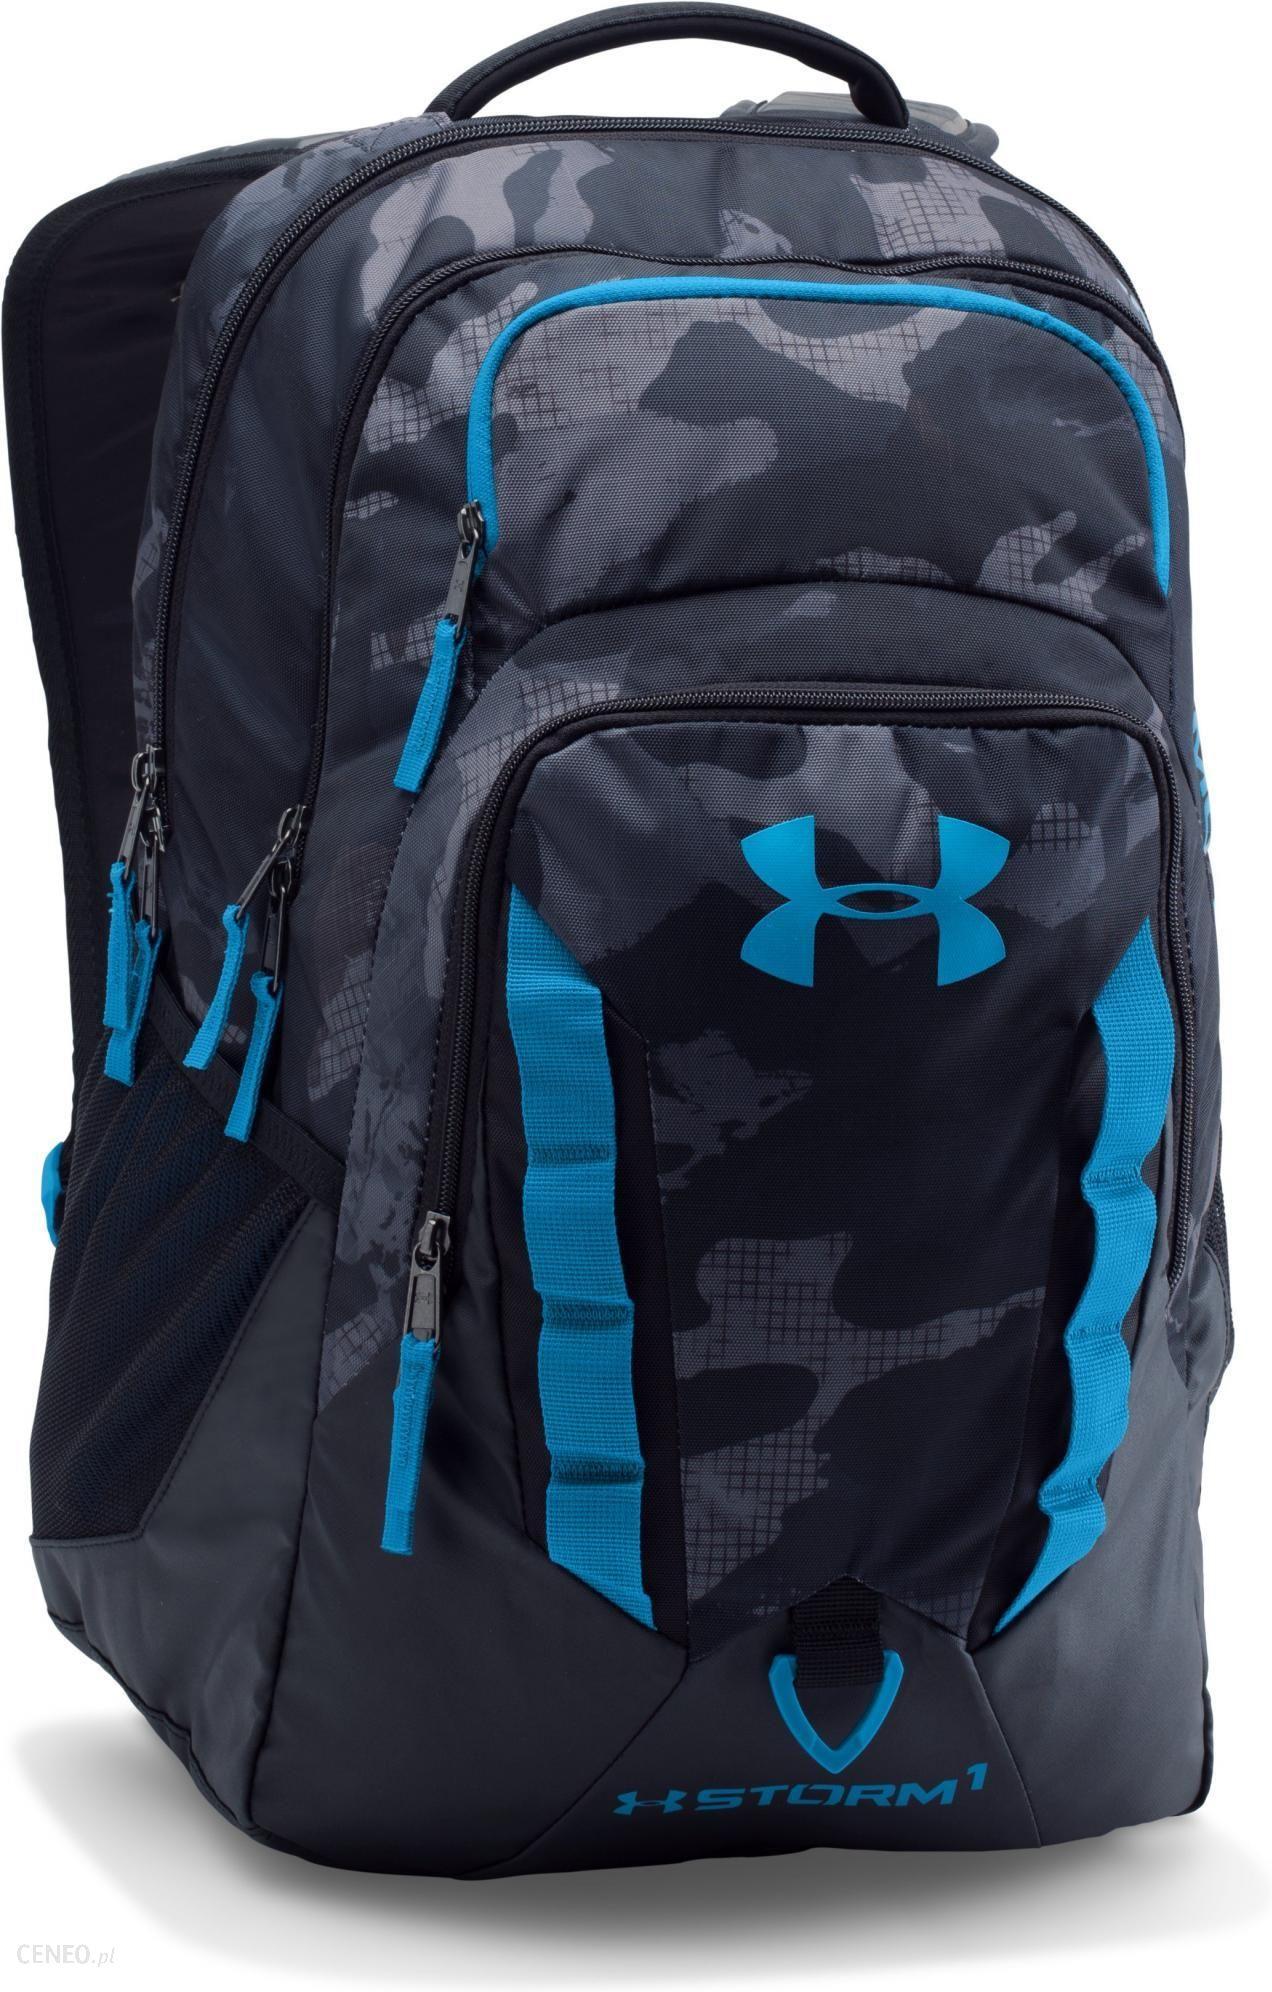 buty do biegania Kup online ogromny zapas Under Armour Recruit Backpack Black Stealth Gray Brilliant Blue